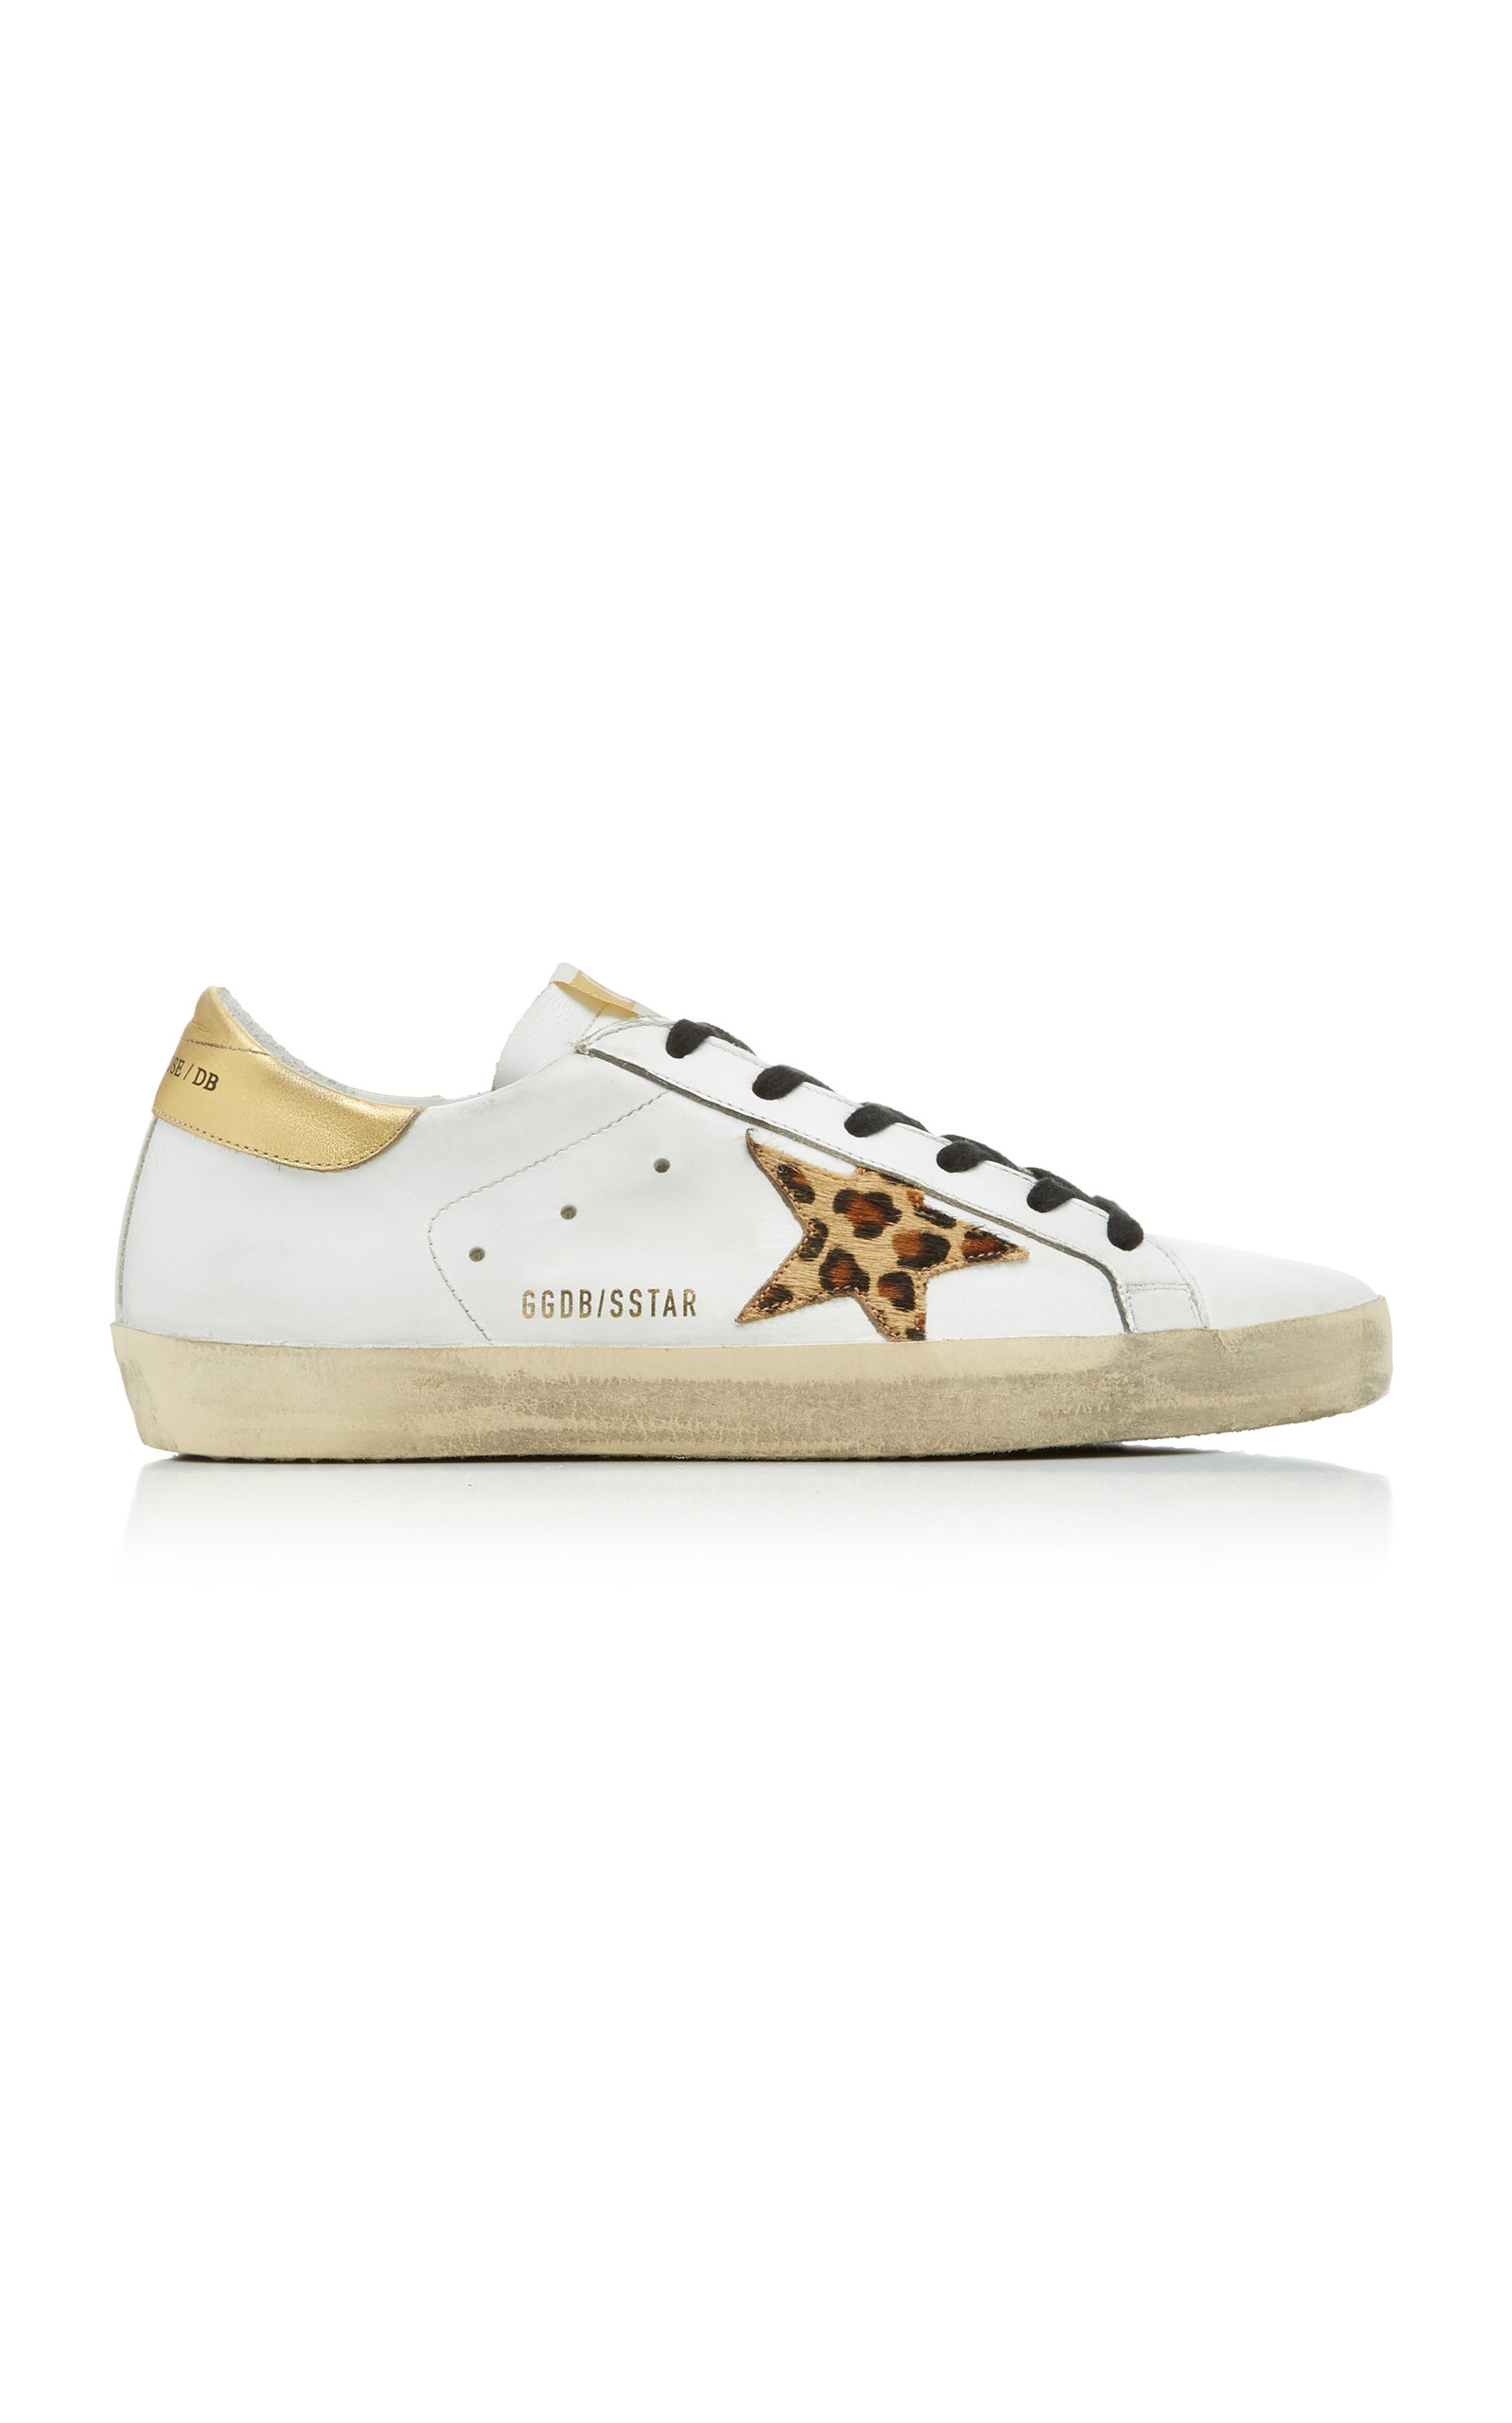 Golden Goose - Women's Superstar Distressed Leather Sneakers - Multi - Moda Operandi